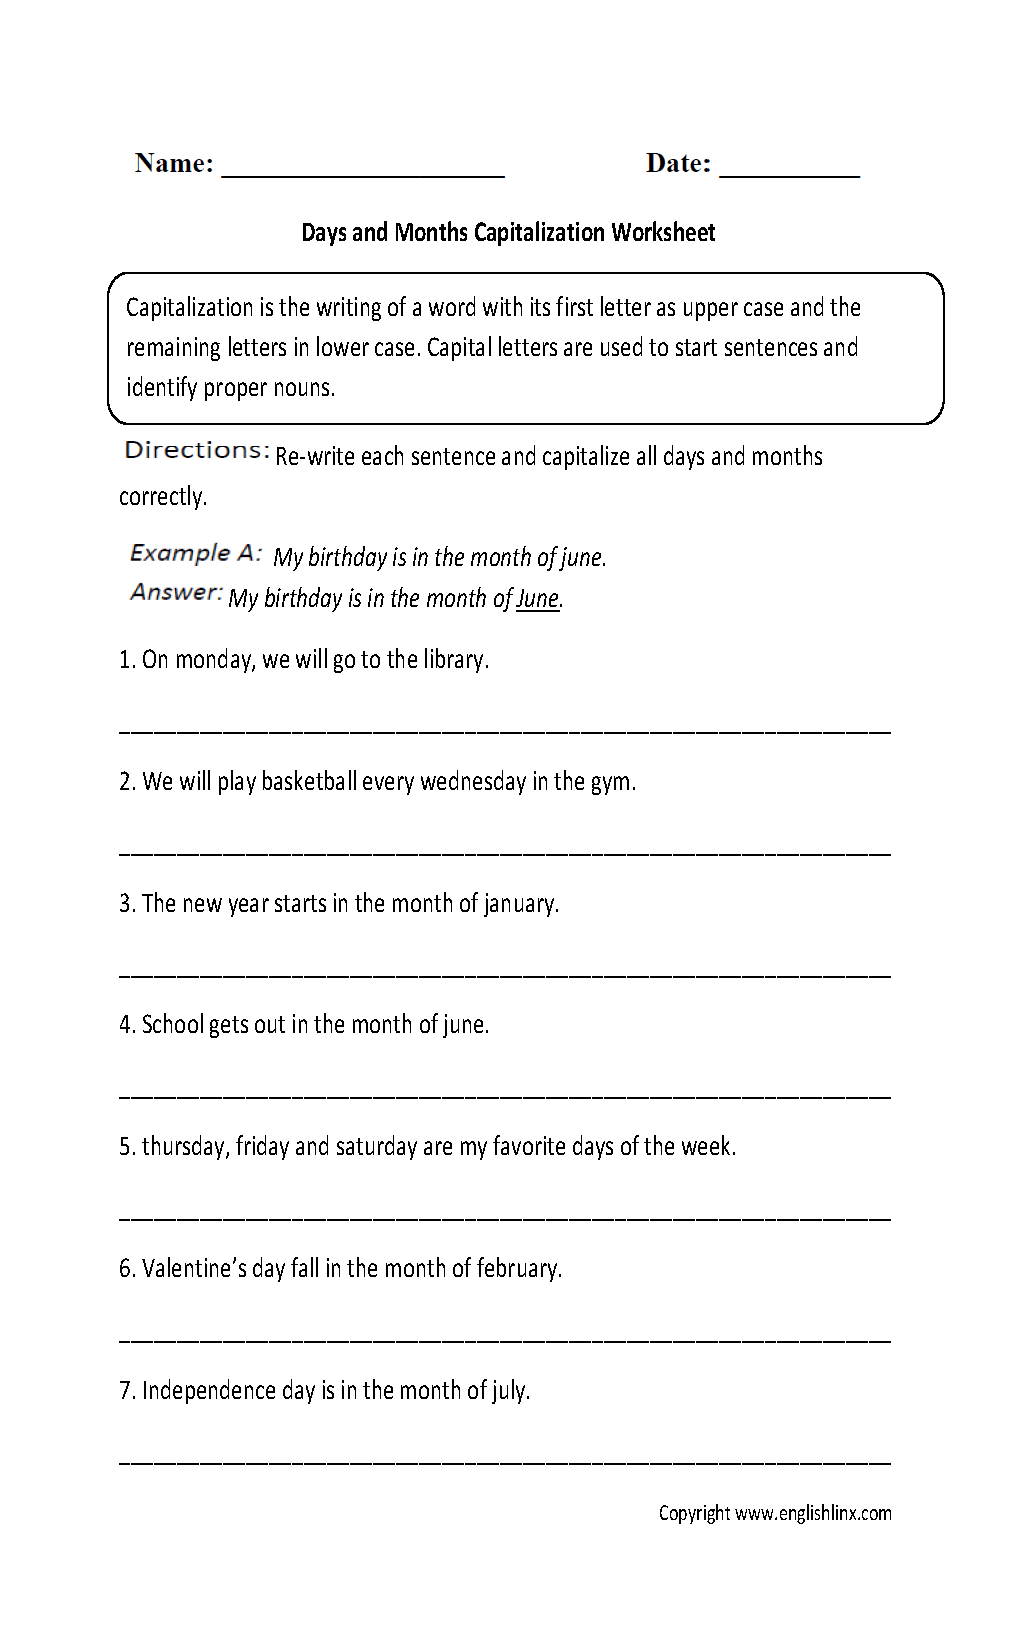 Grammar Mechanics Worksheets Capitalization Worksheets